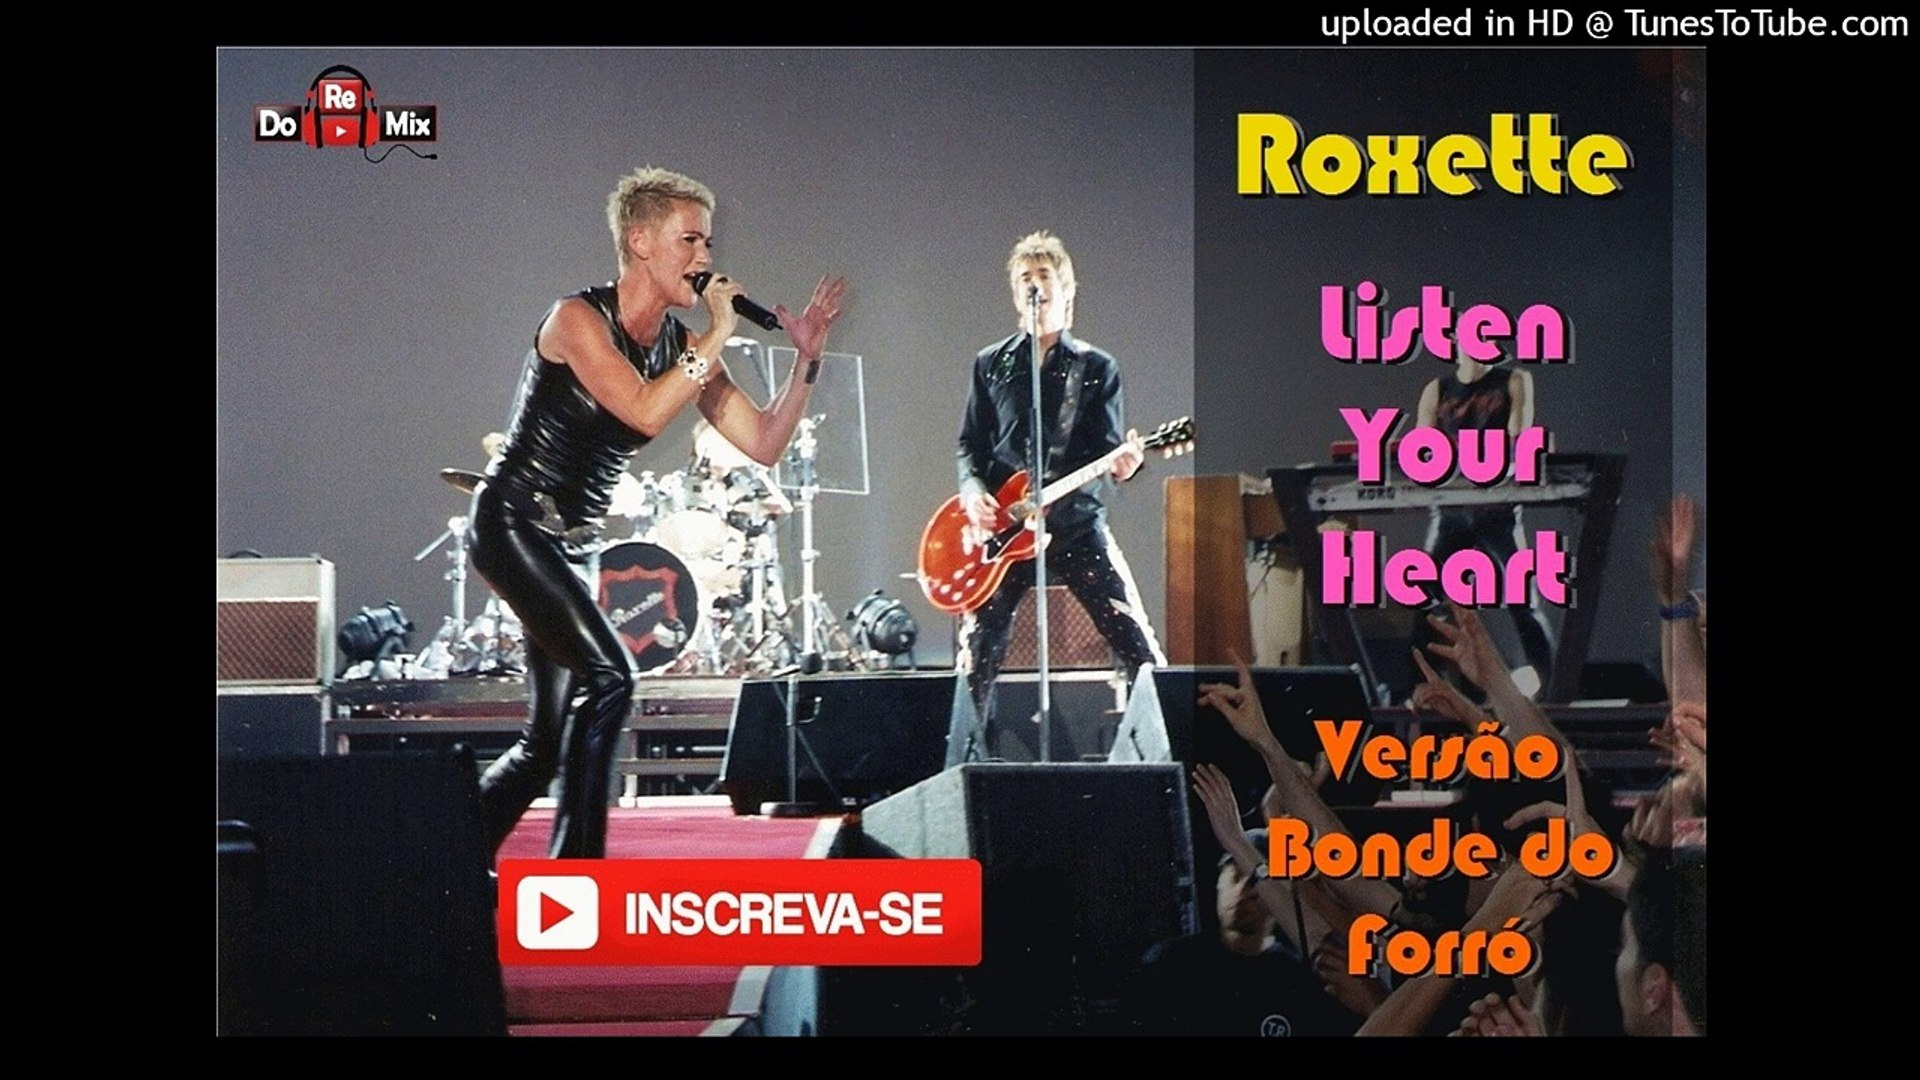 Roxette - Listen Your Heart ( Bonde do forró )